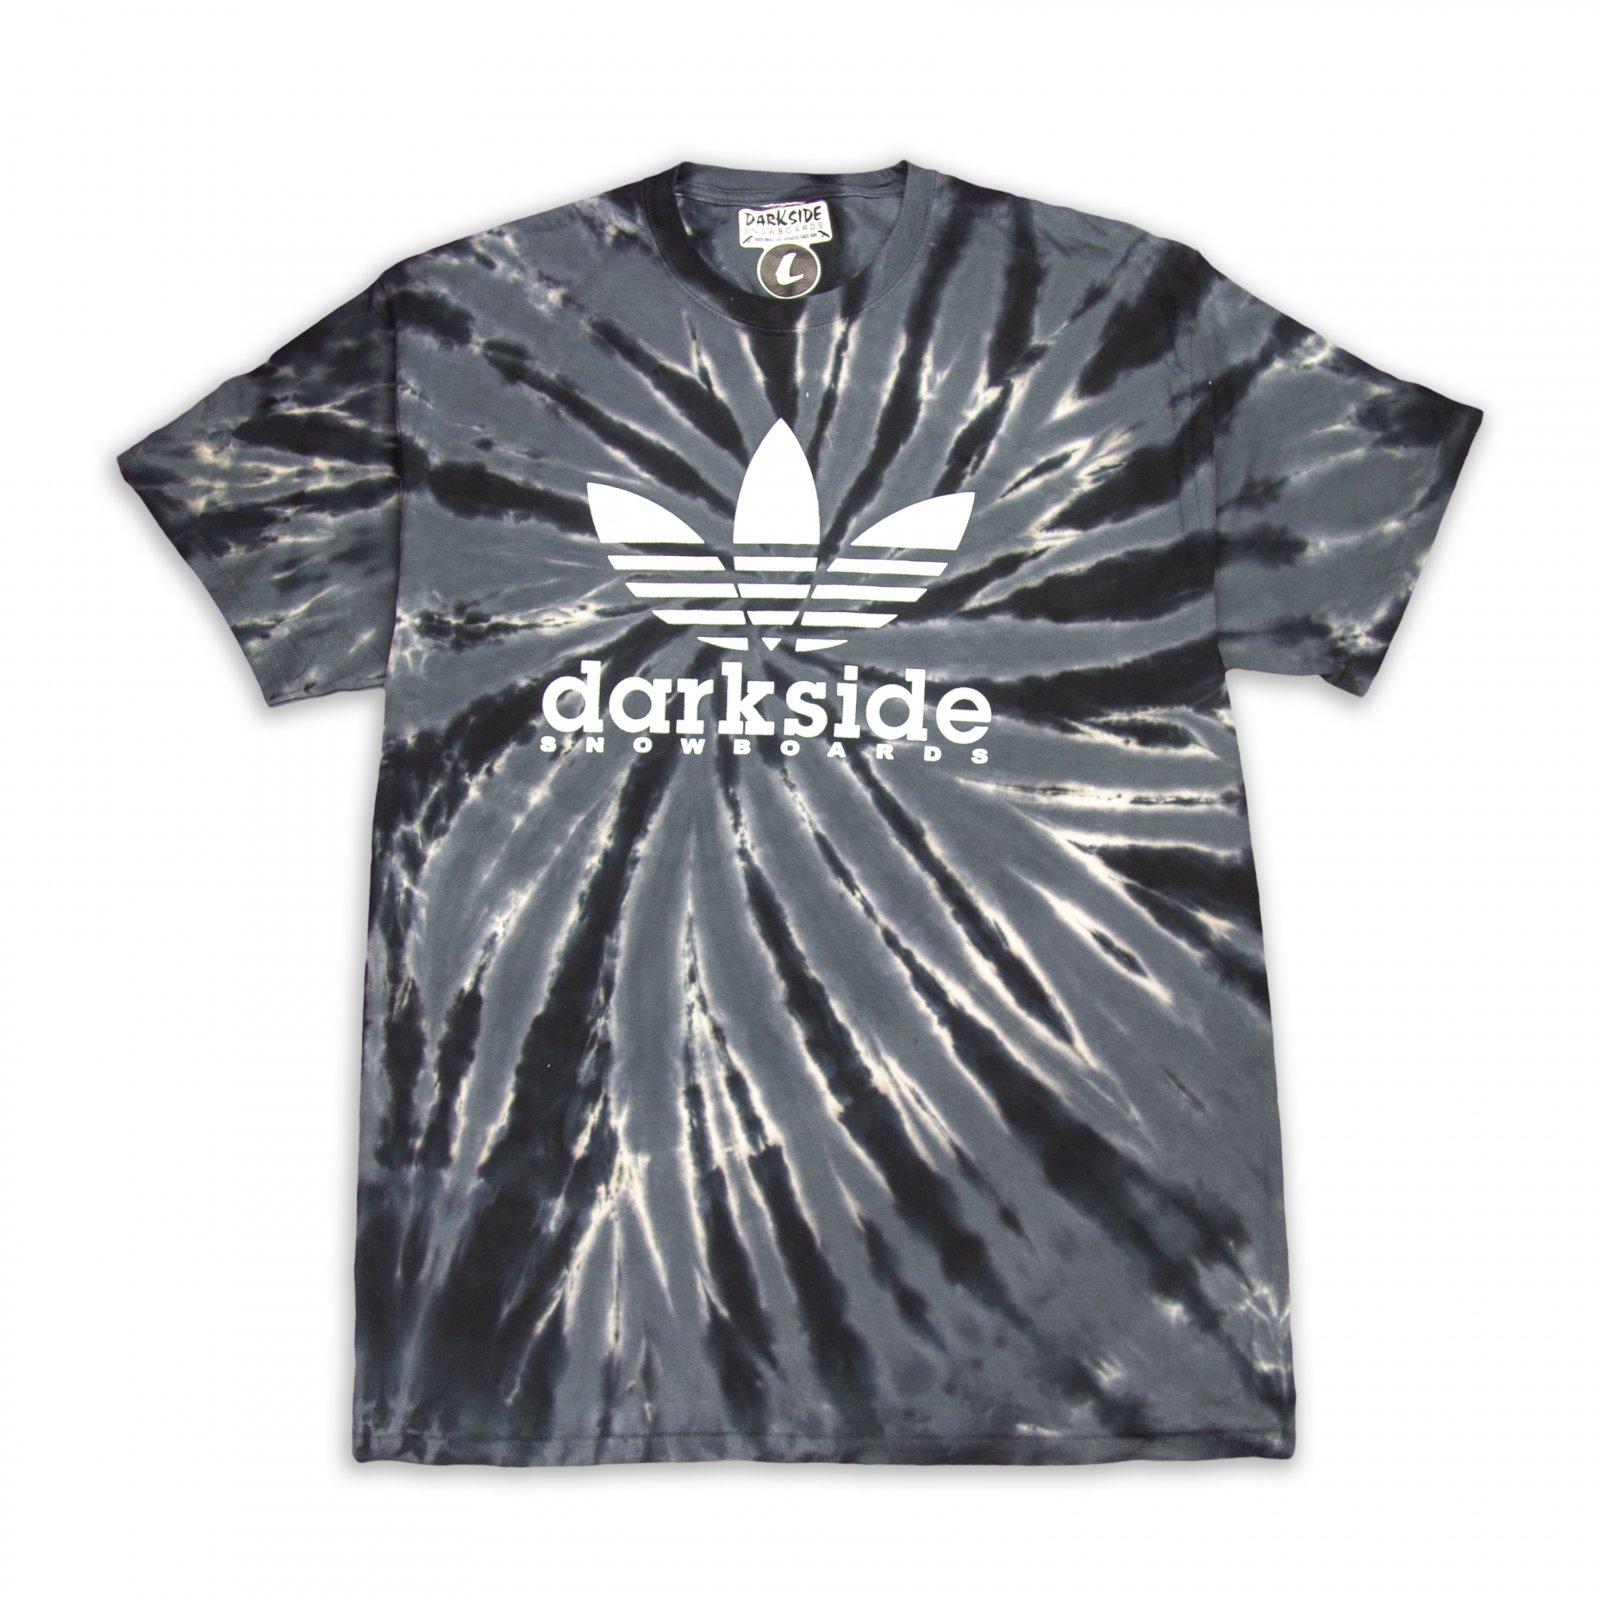 Darkside Four Stripe Tie Dye Tee Shirt